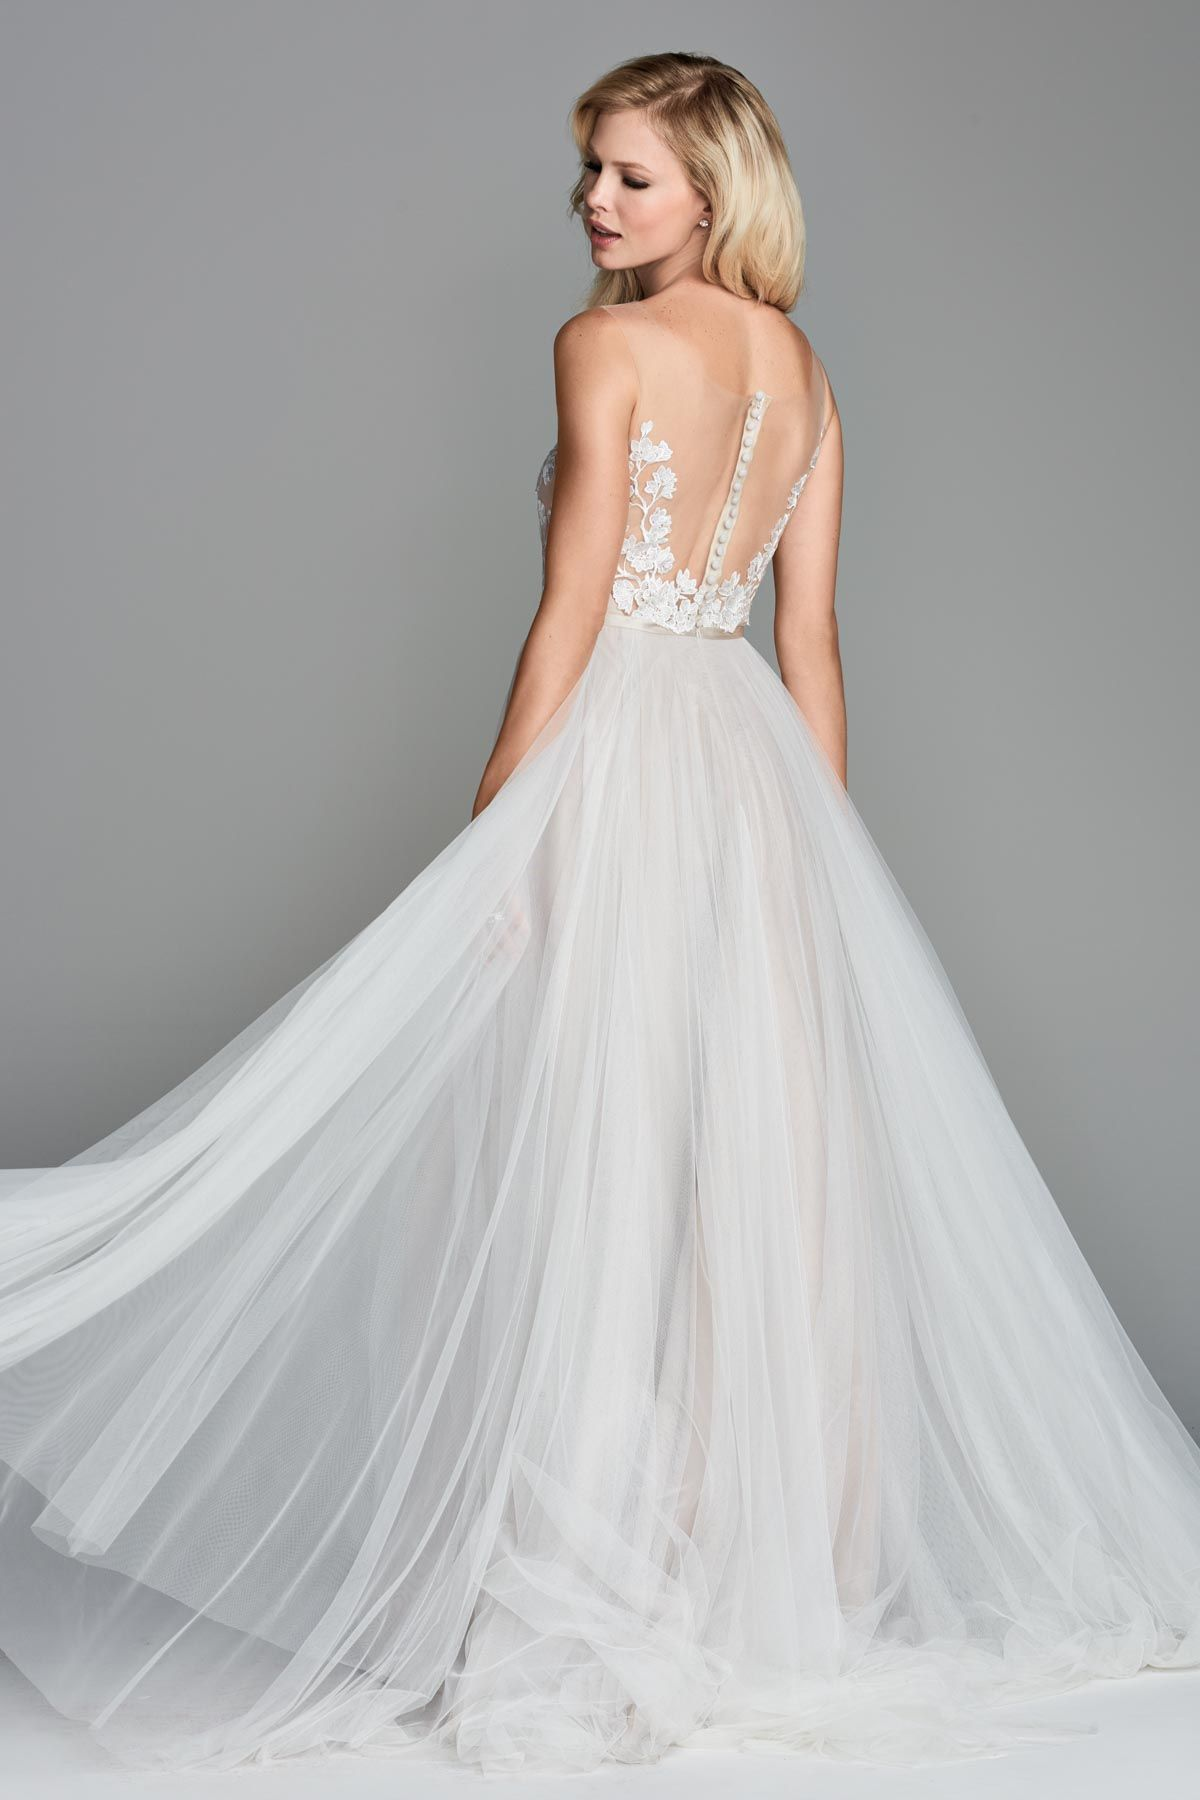 Juno 10702 | Wtoo Brides | Wtoo | Wedding | Pinterest | Wedding